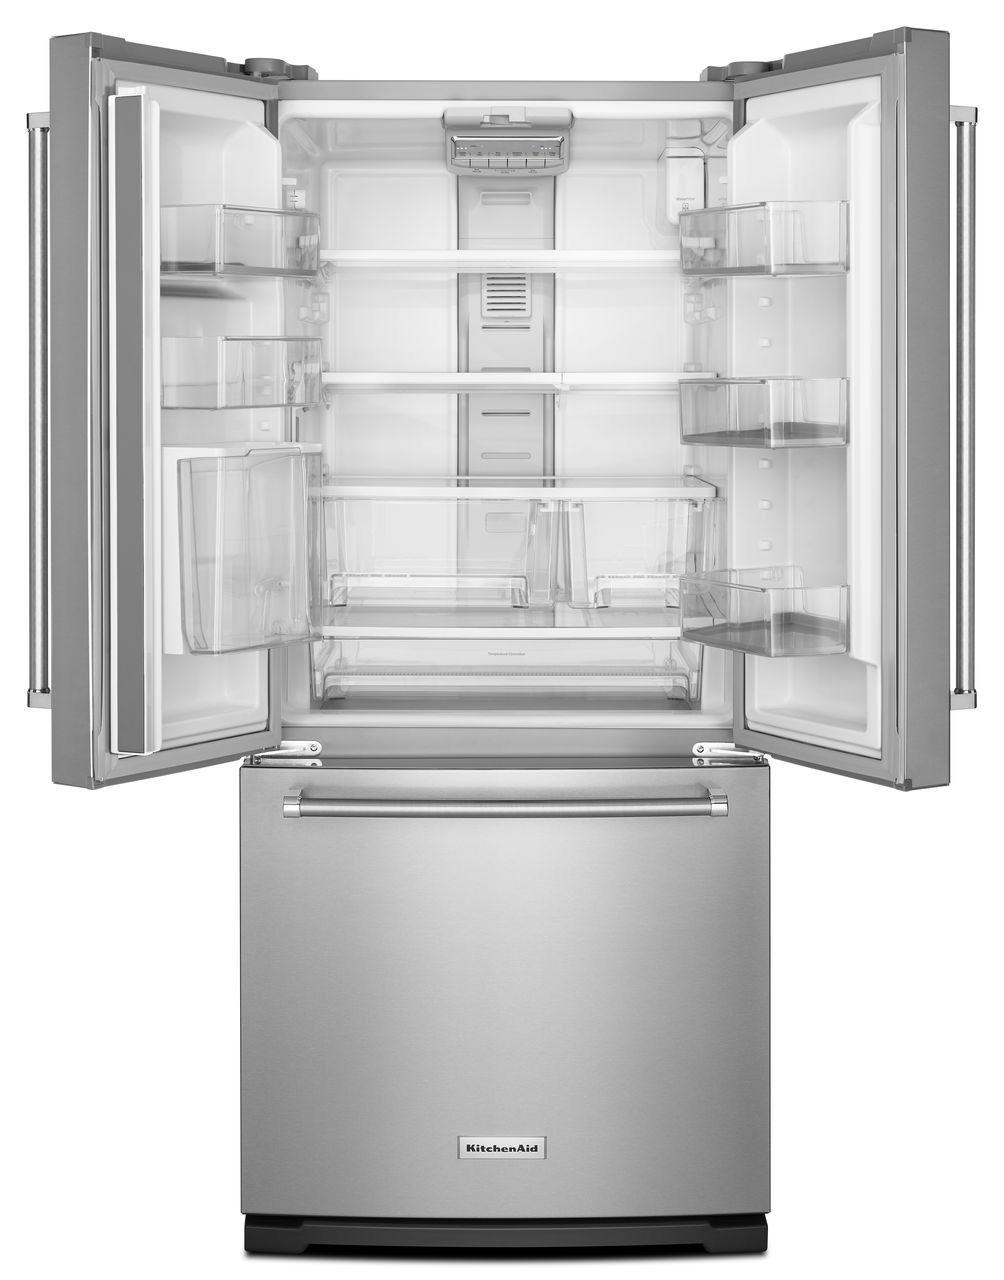 Kitchenaid ice maker hookup